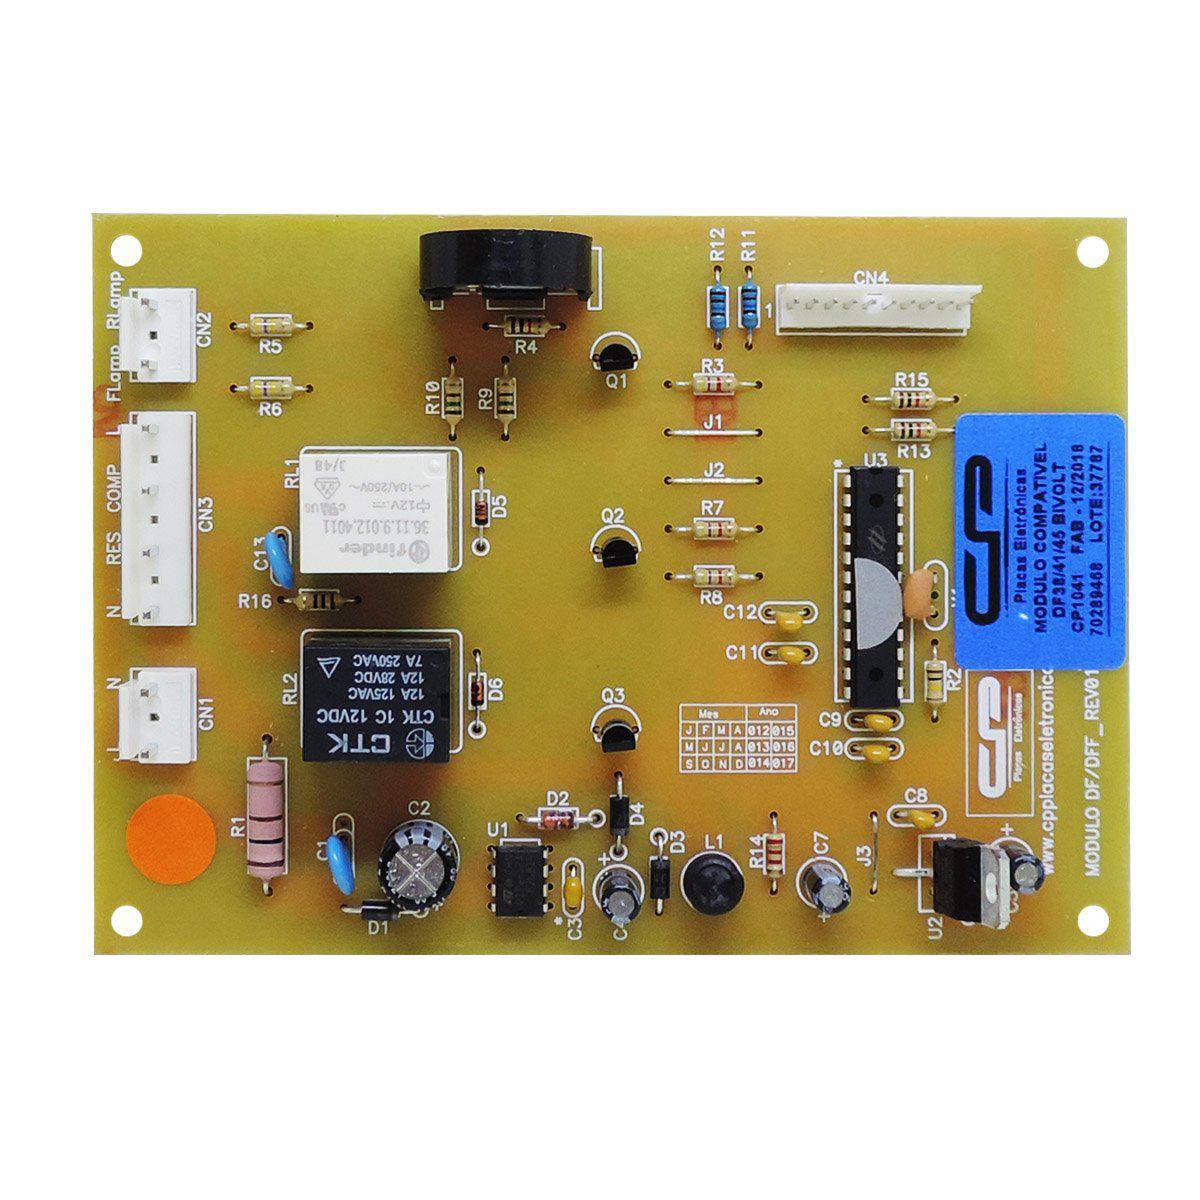 Placa Potência CP PLACAS Refrigerador Electrolux Df38 Df41 Df45 70289468